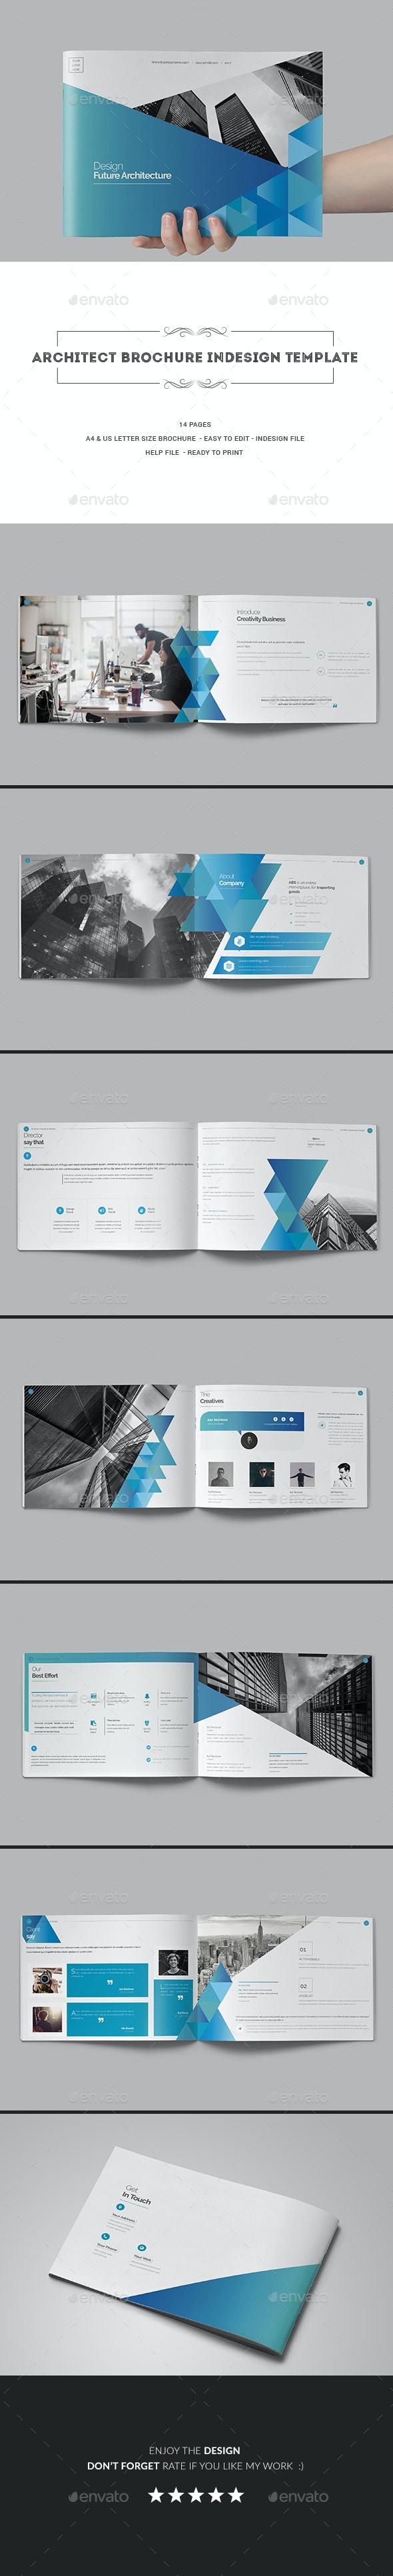 Architect Brochure Indesign Template - Corporate Brochures